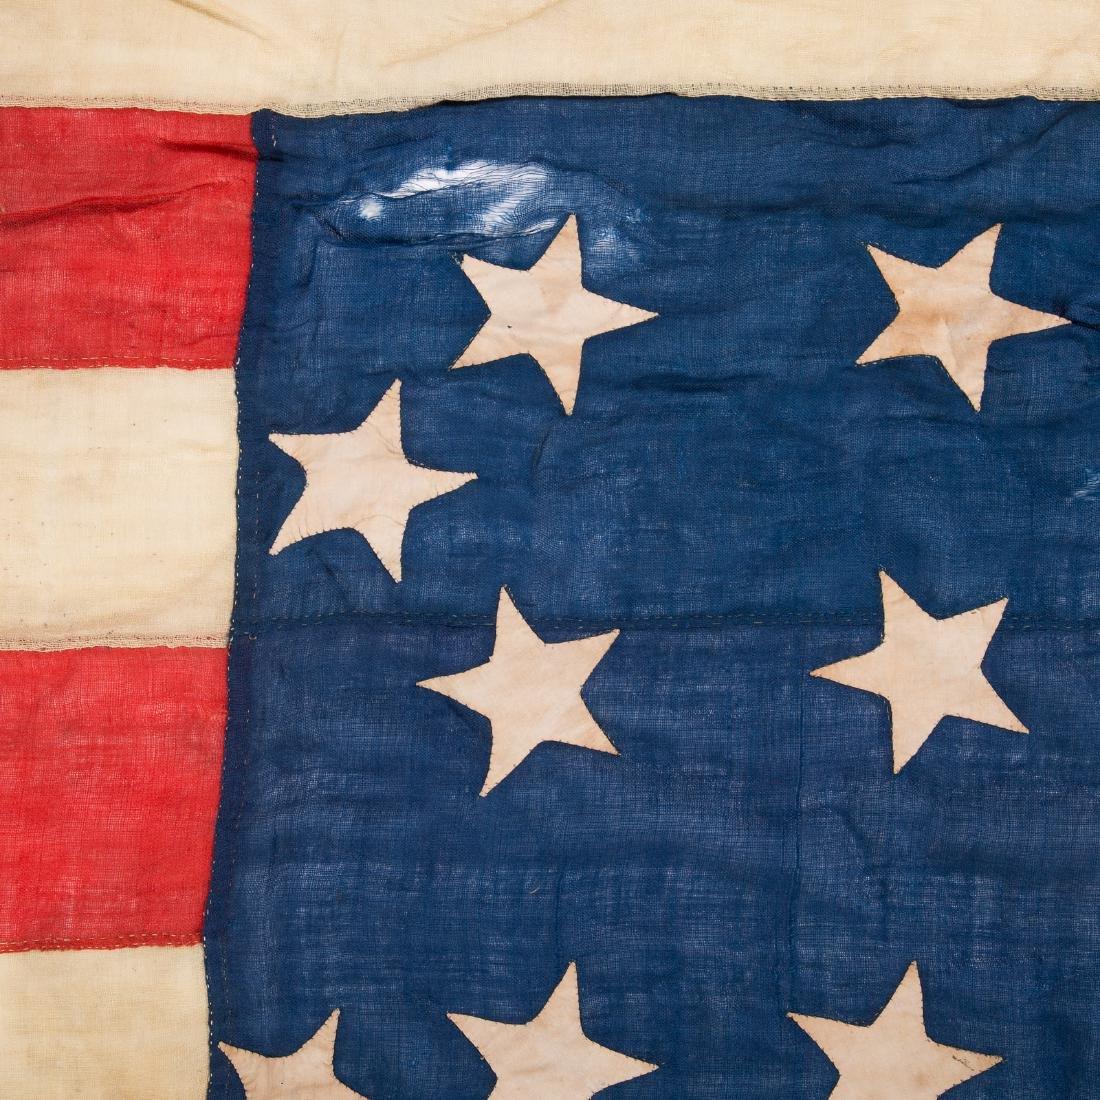 United States 34-star garrison flag - 8